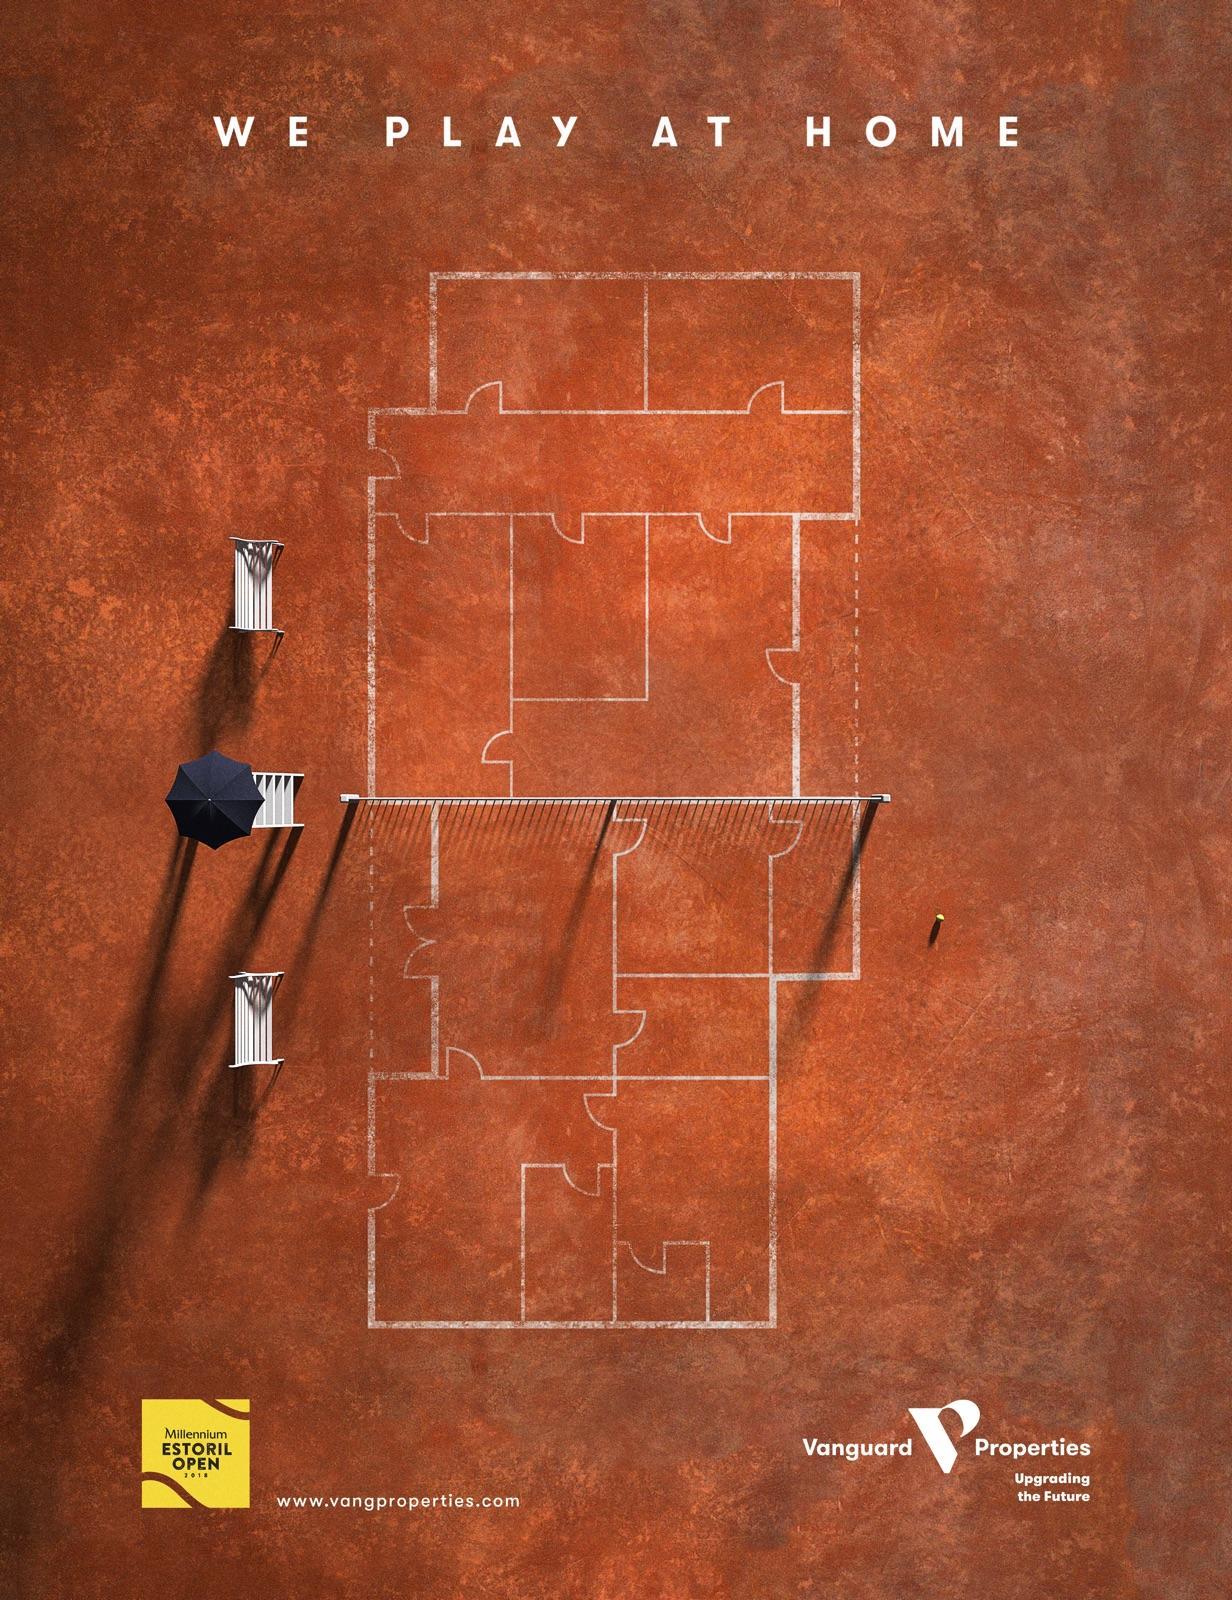 Vanguard Properties Print Ad - We Play At Home